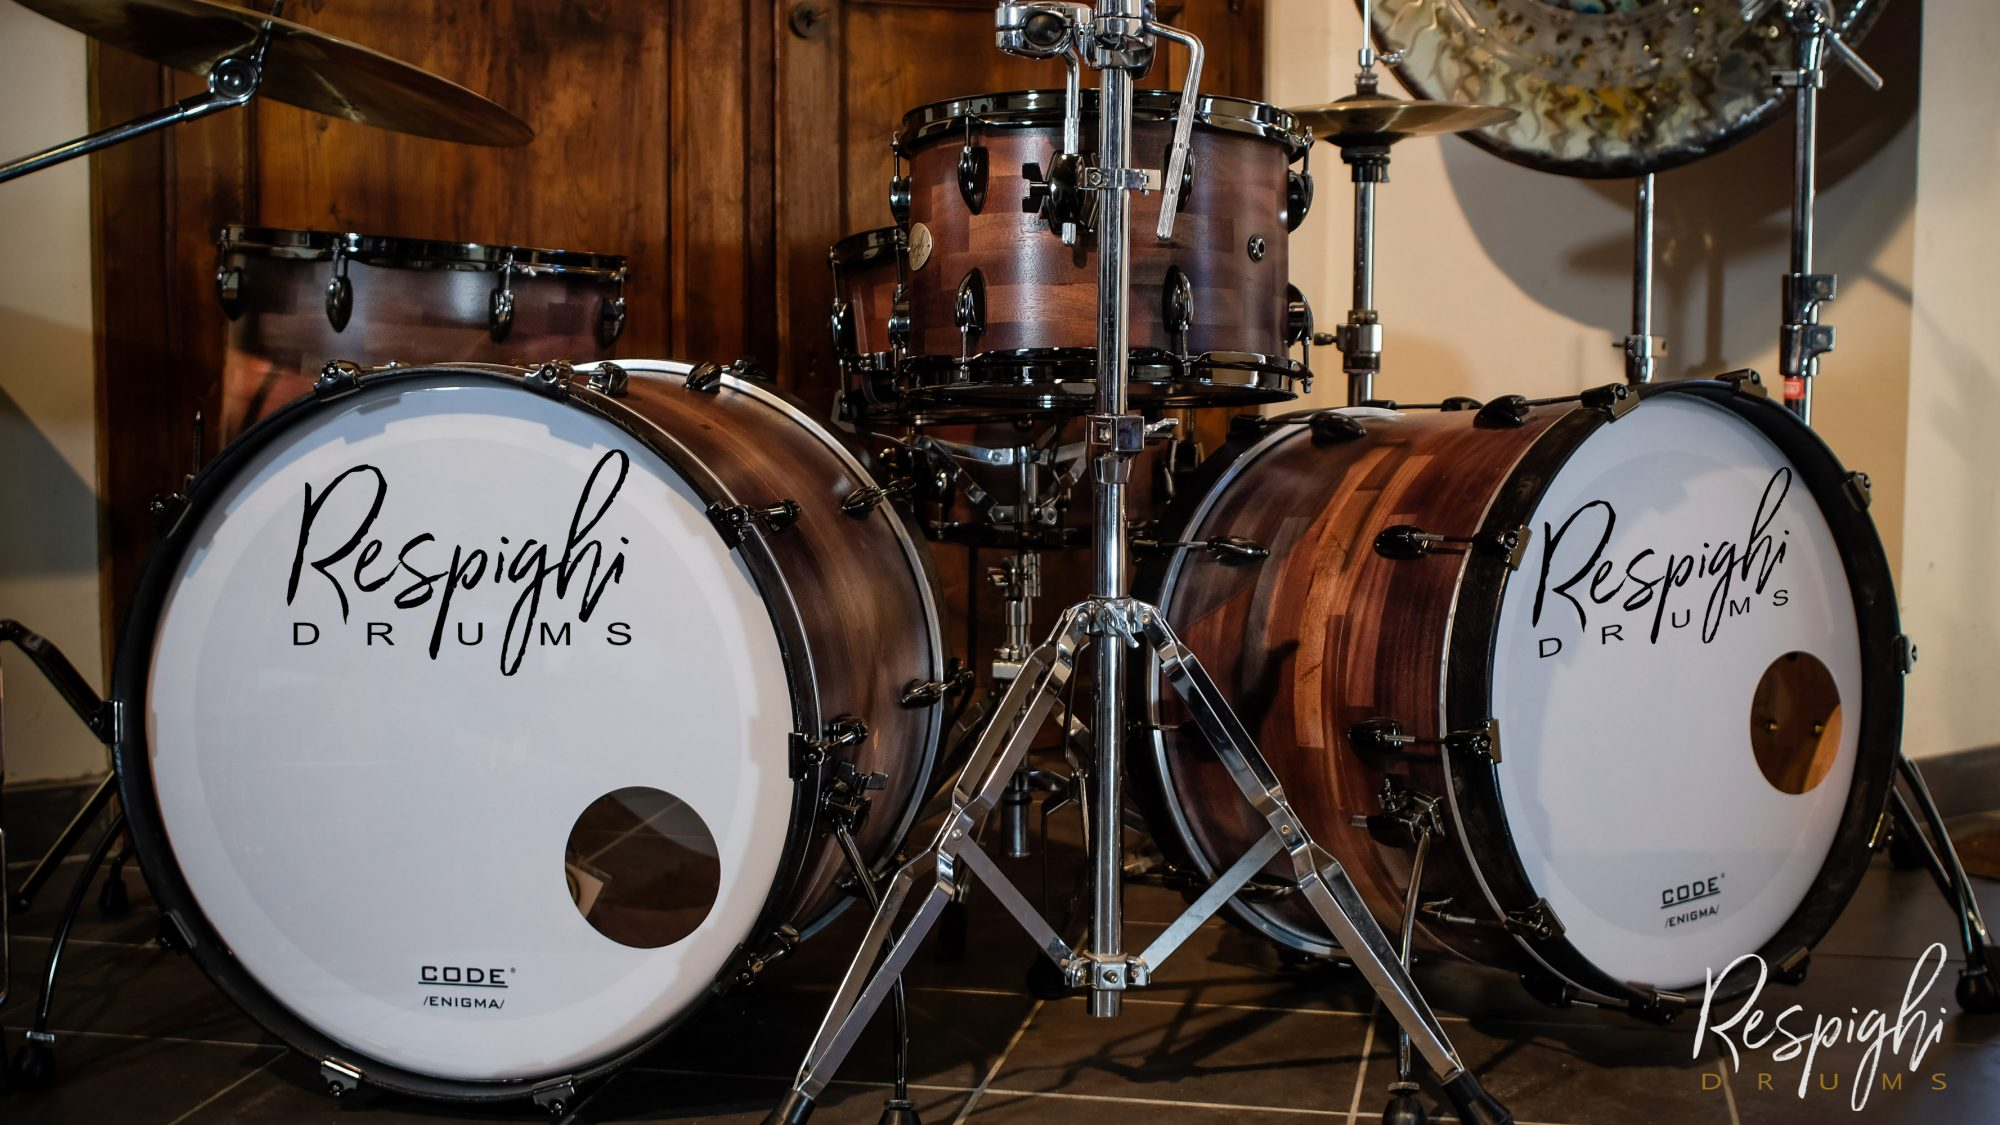 set batteria artigianale Irish black con sistema magtrioska in mogano